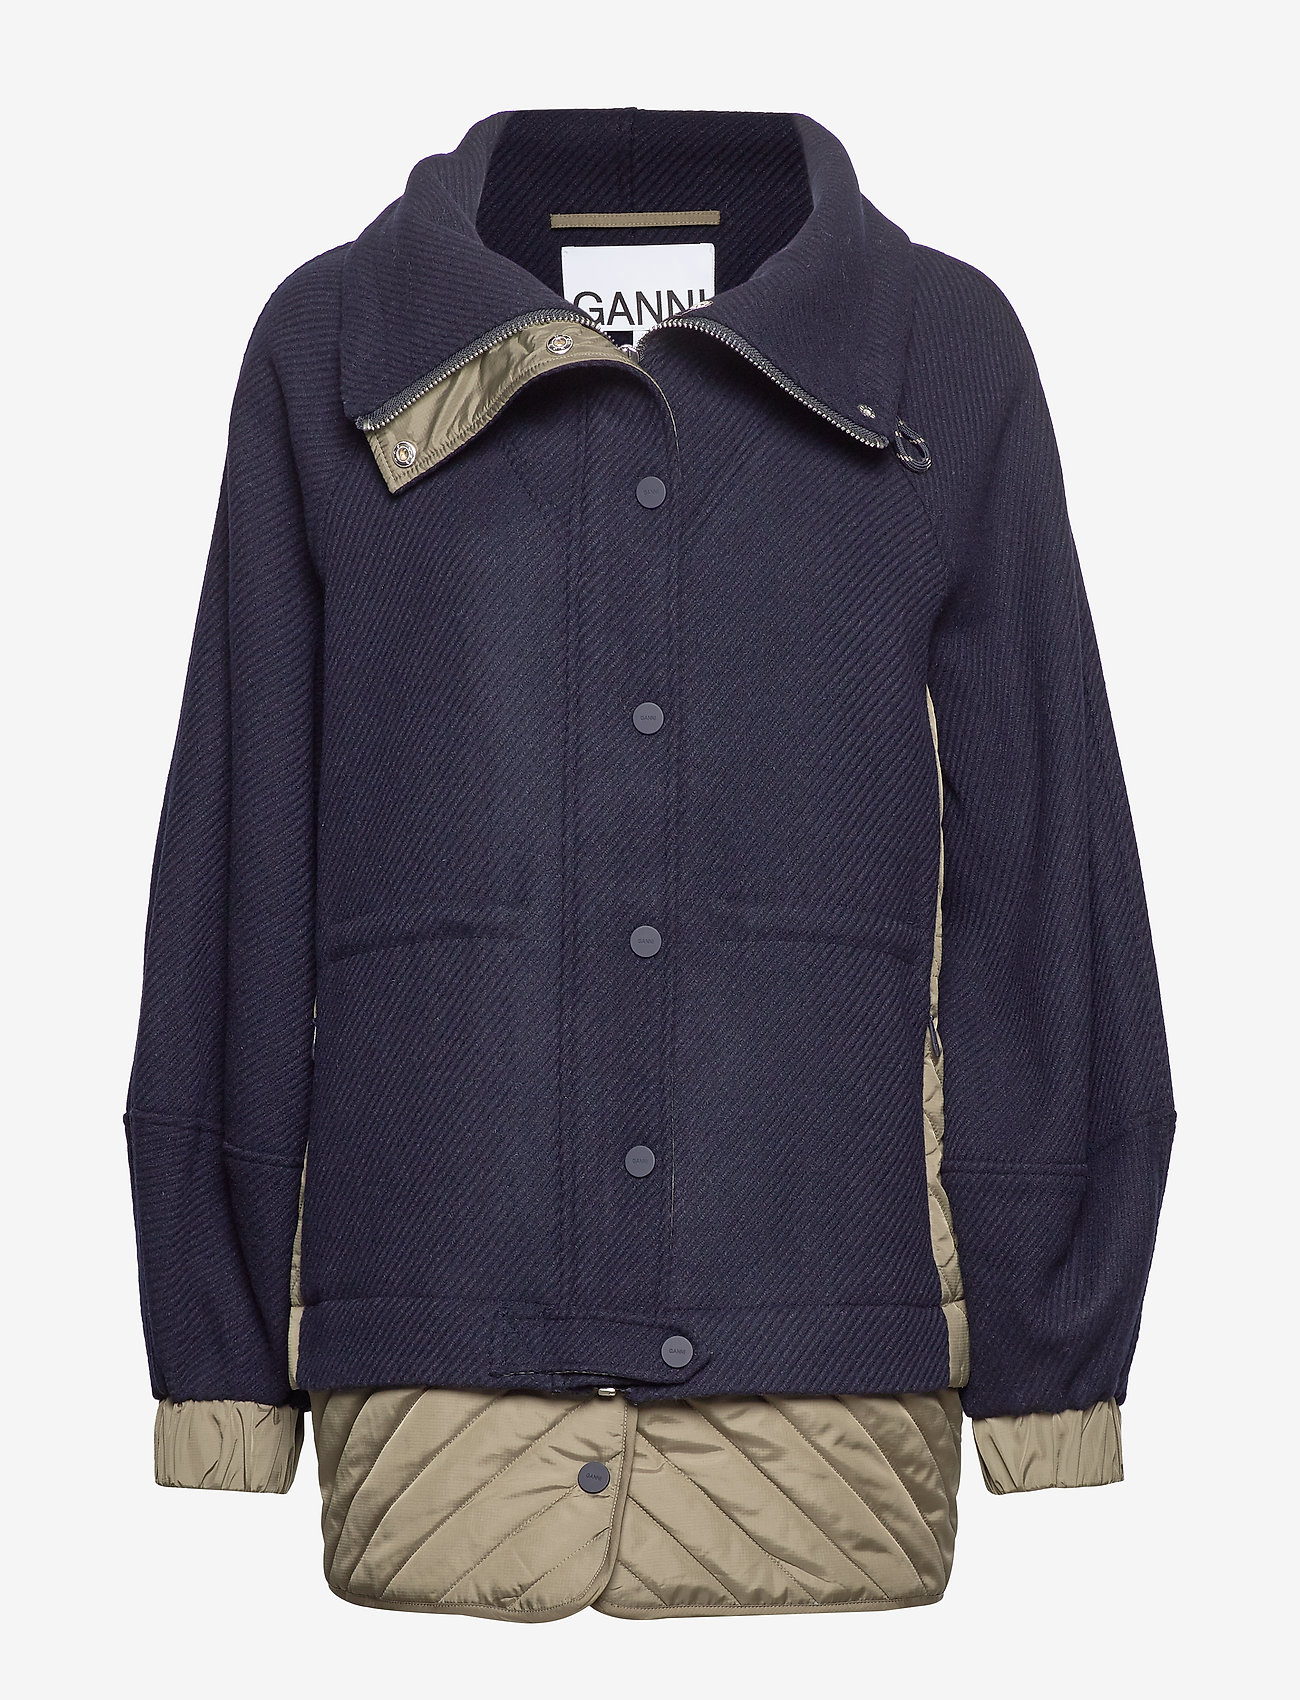 Ganni - Tech/Wool - wełniane kurtki - sky captain - 0